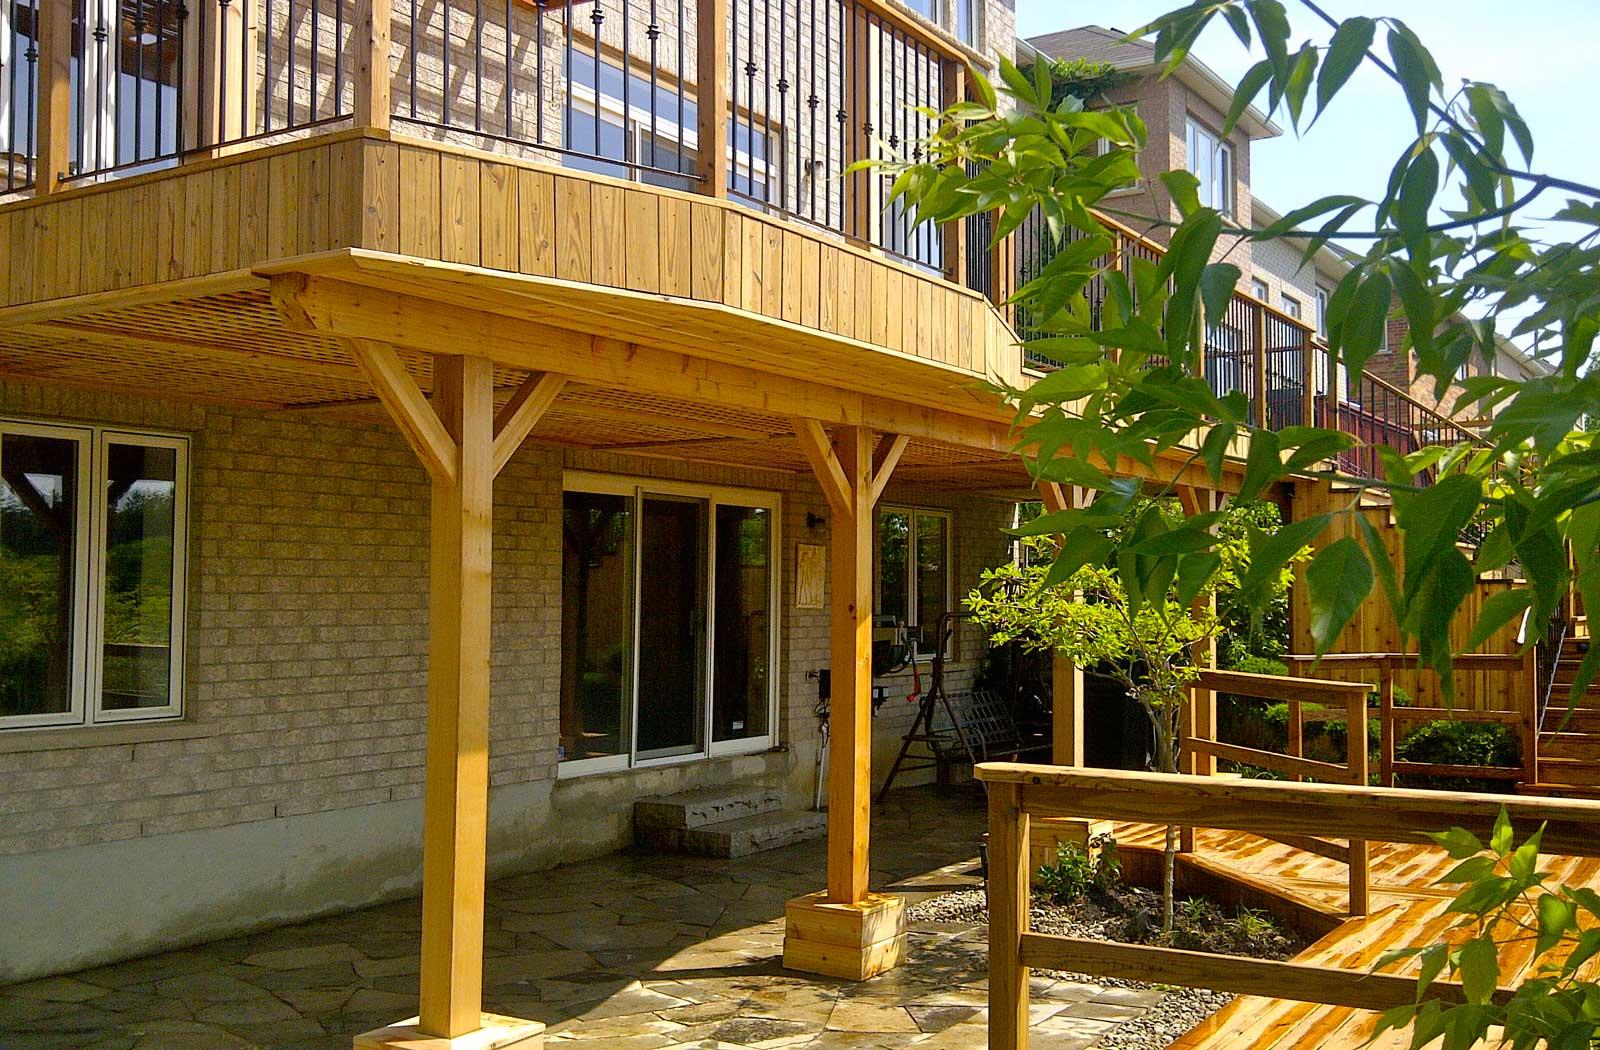 cedar deck and railings with flagstone patio